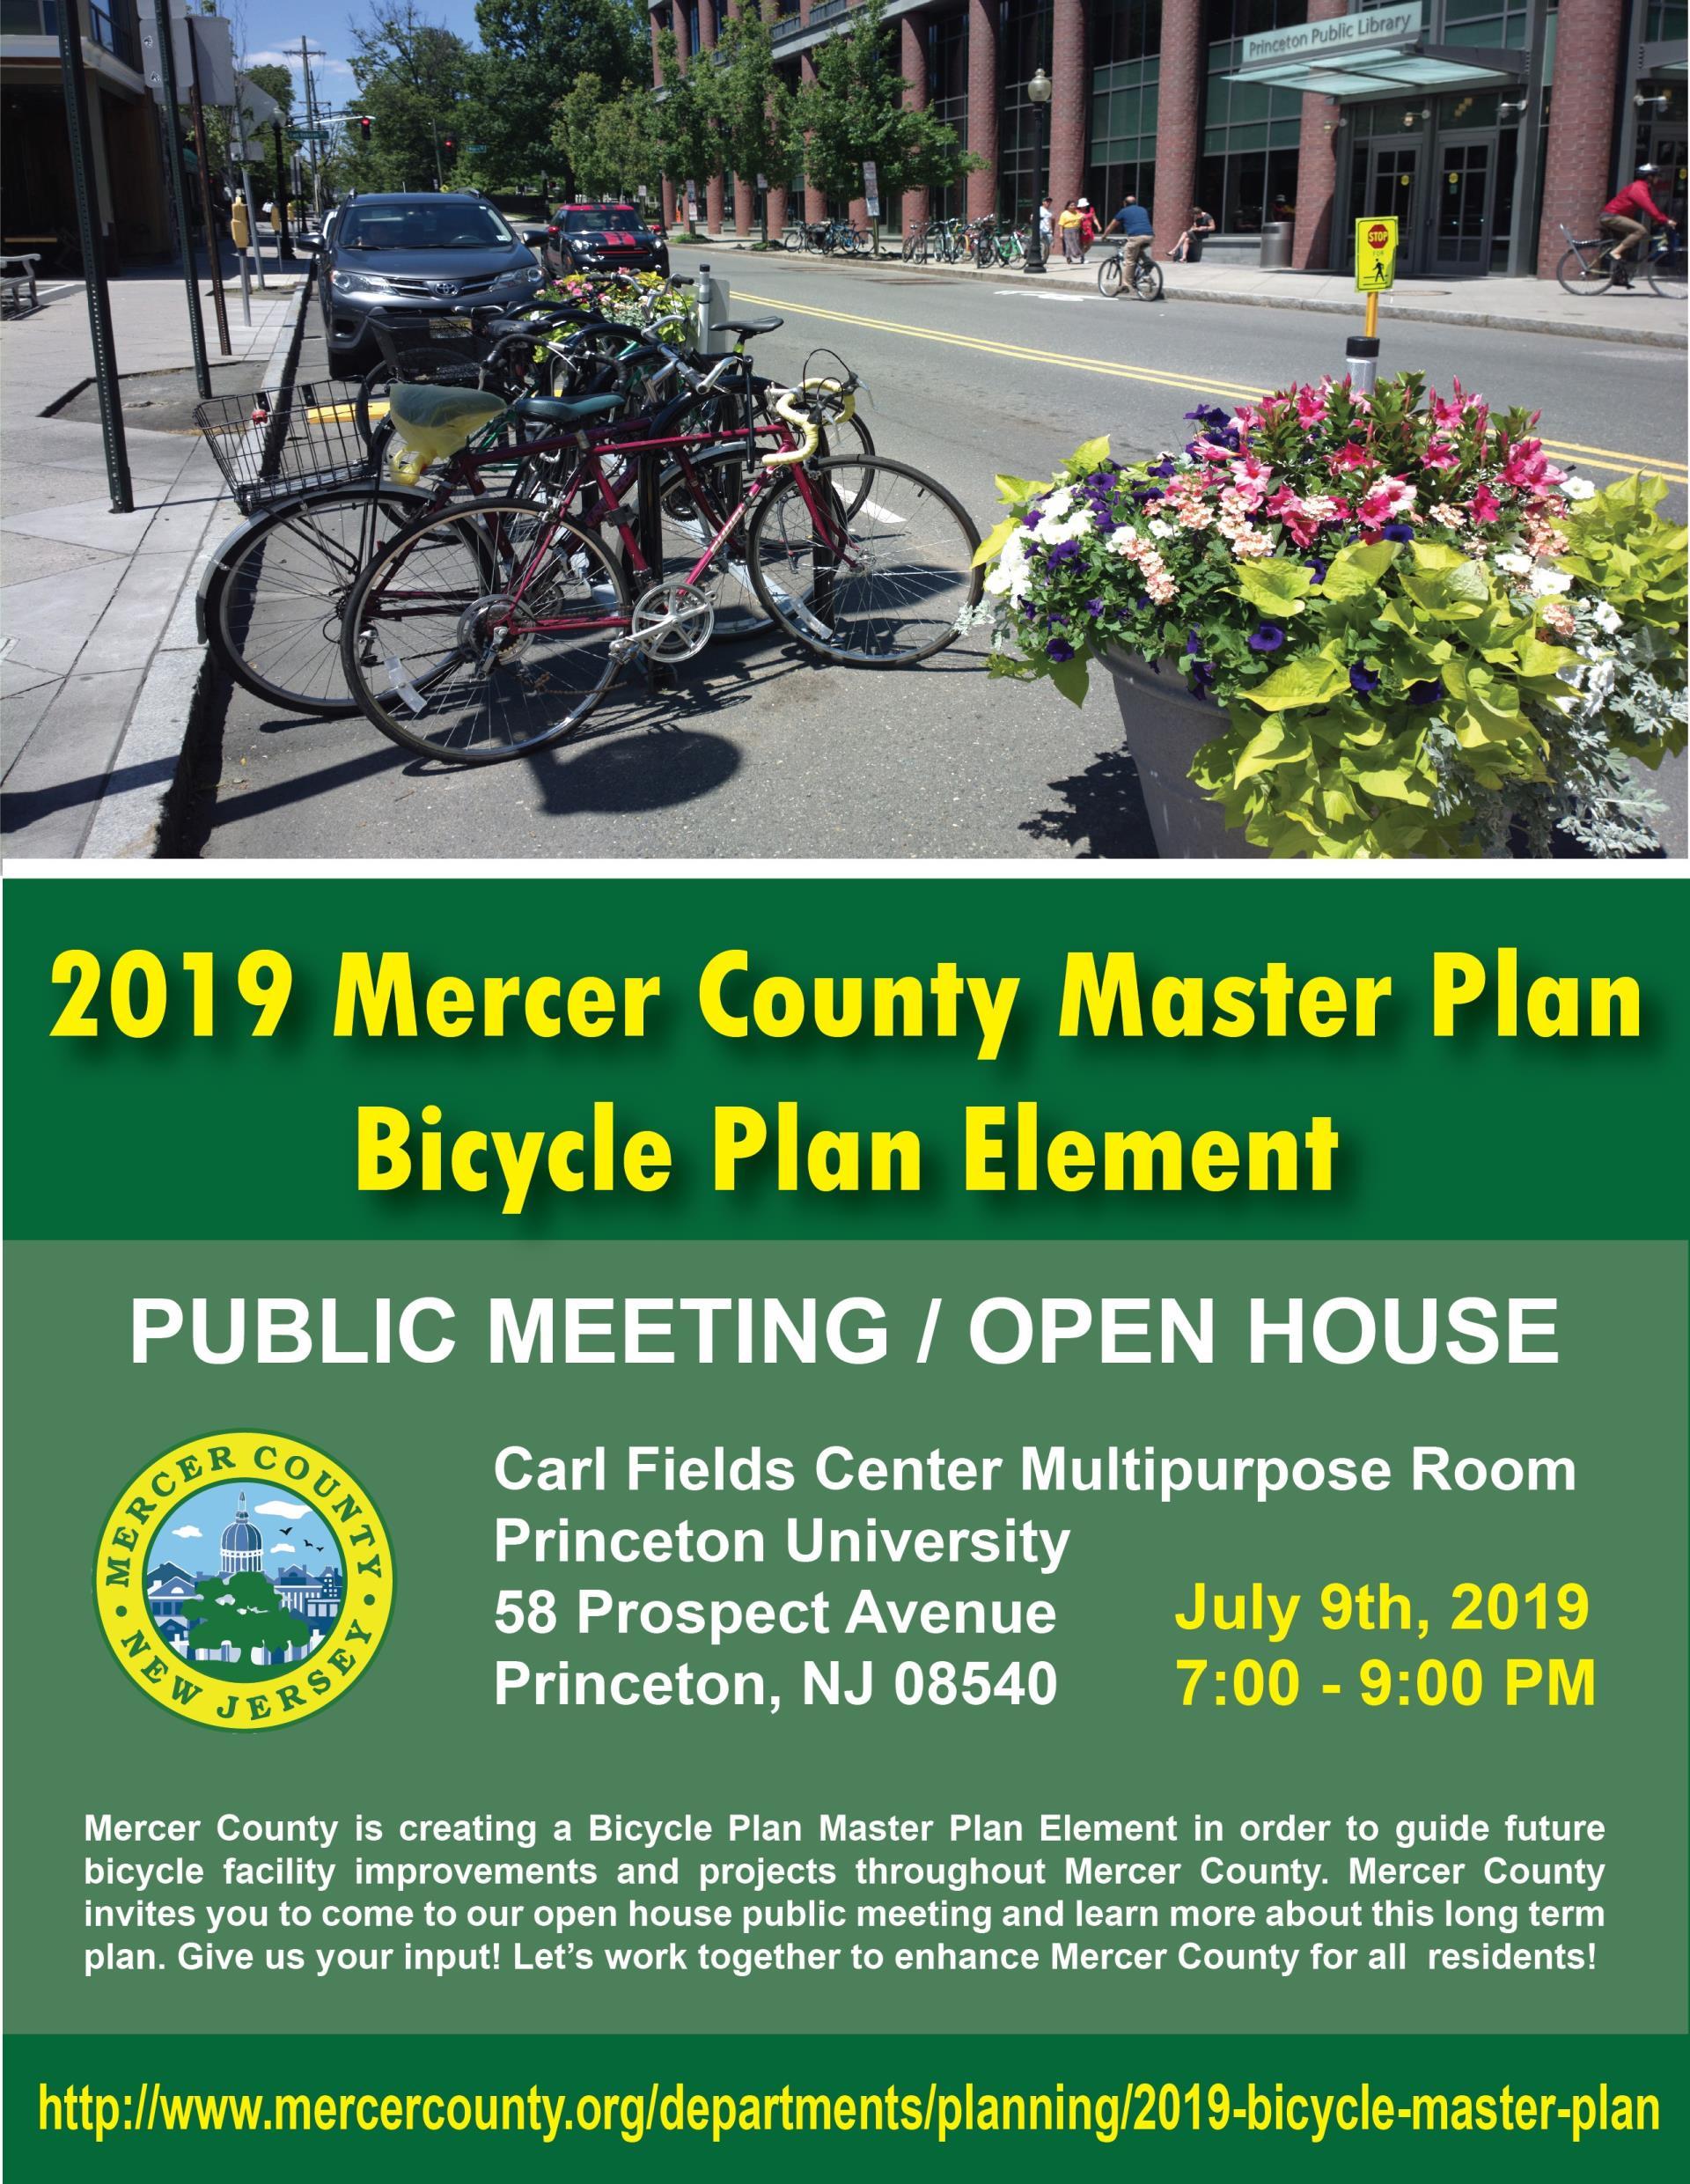 Mercer Calendar 2019 2019 Mercer County Master Plan Bicycle Plan Element Public Meeting